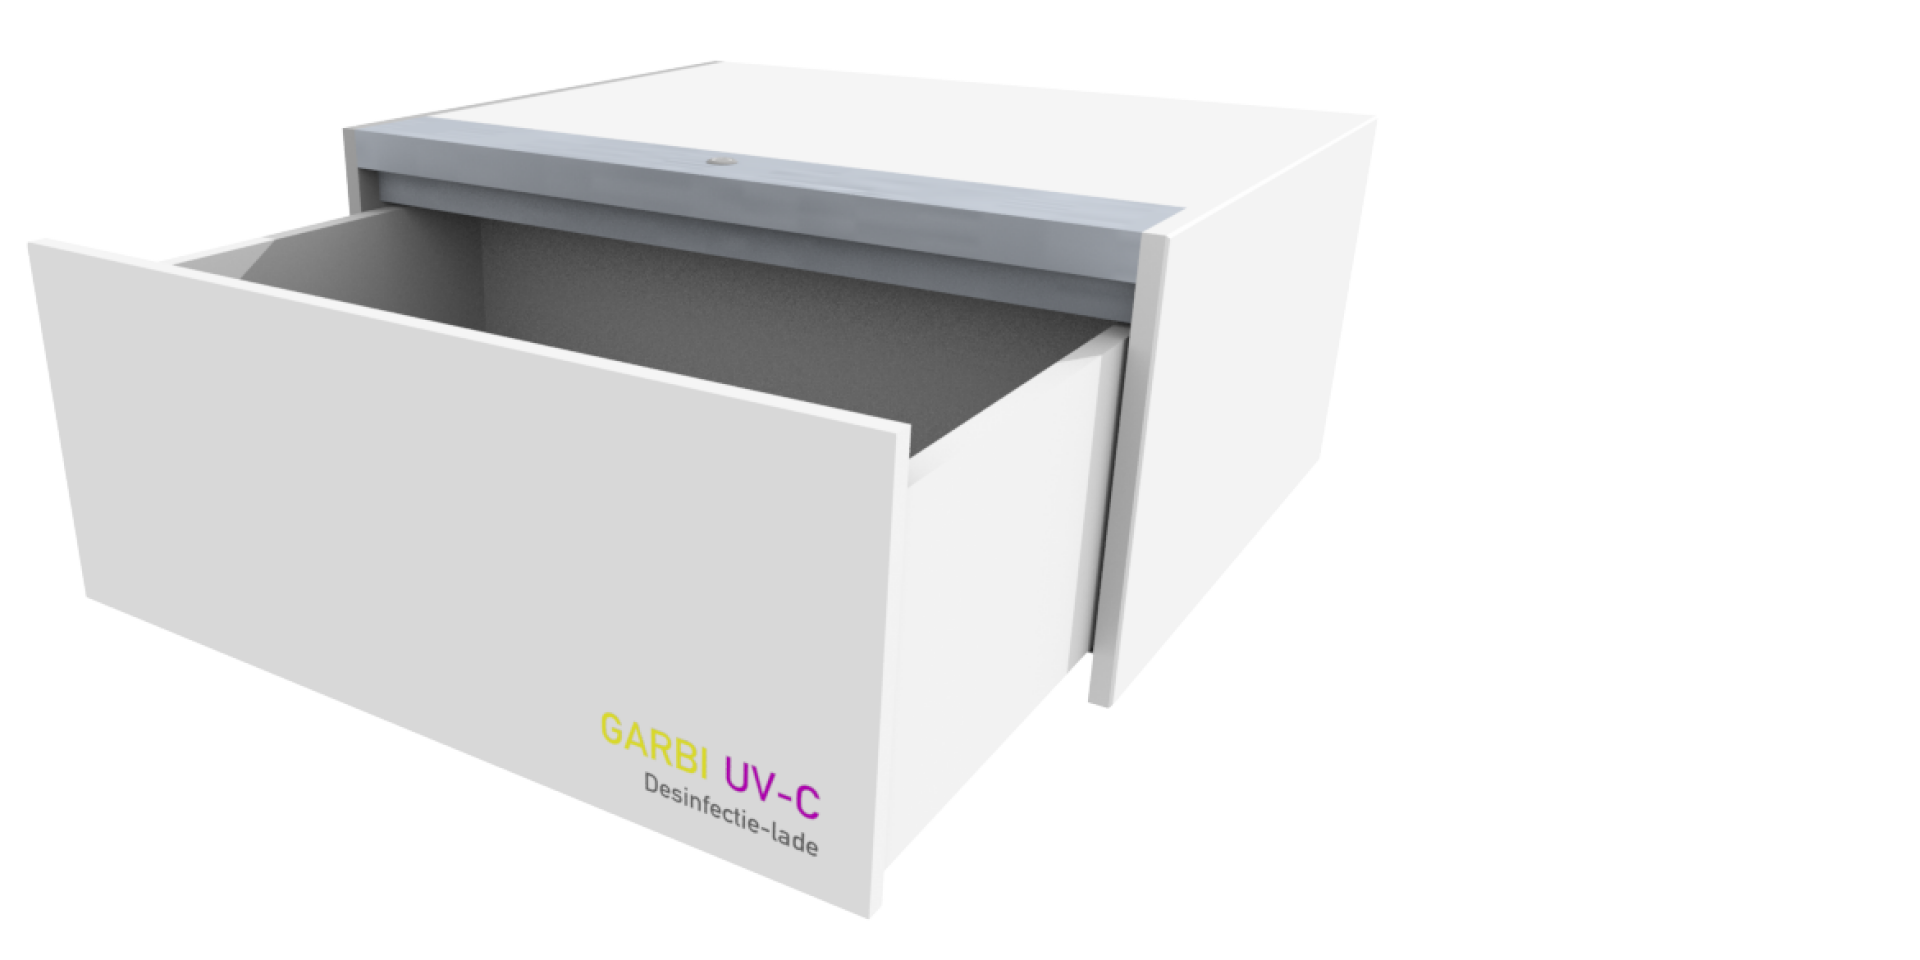 GARBI UV-C Desinfectielade